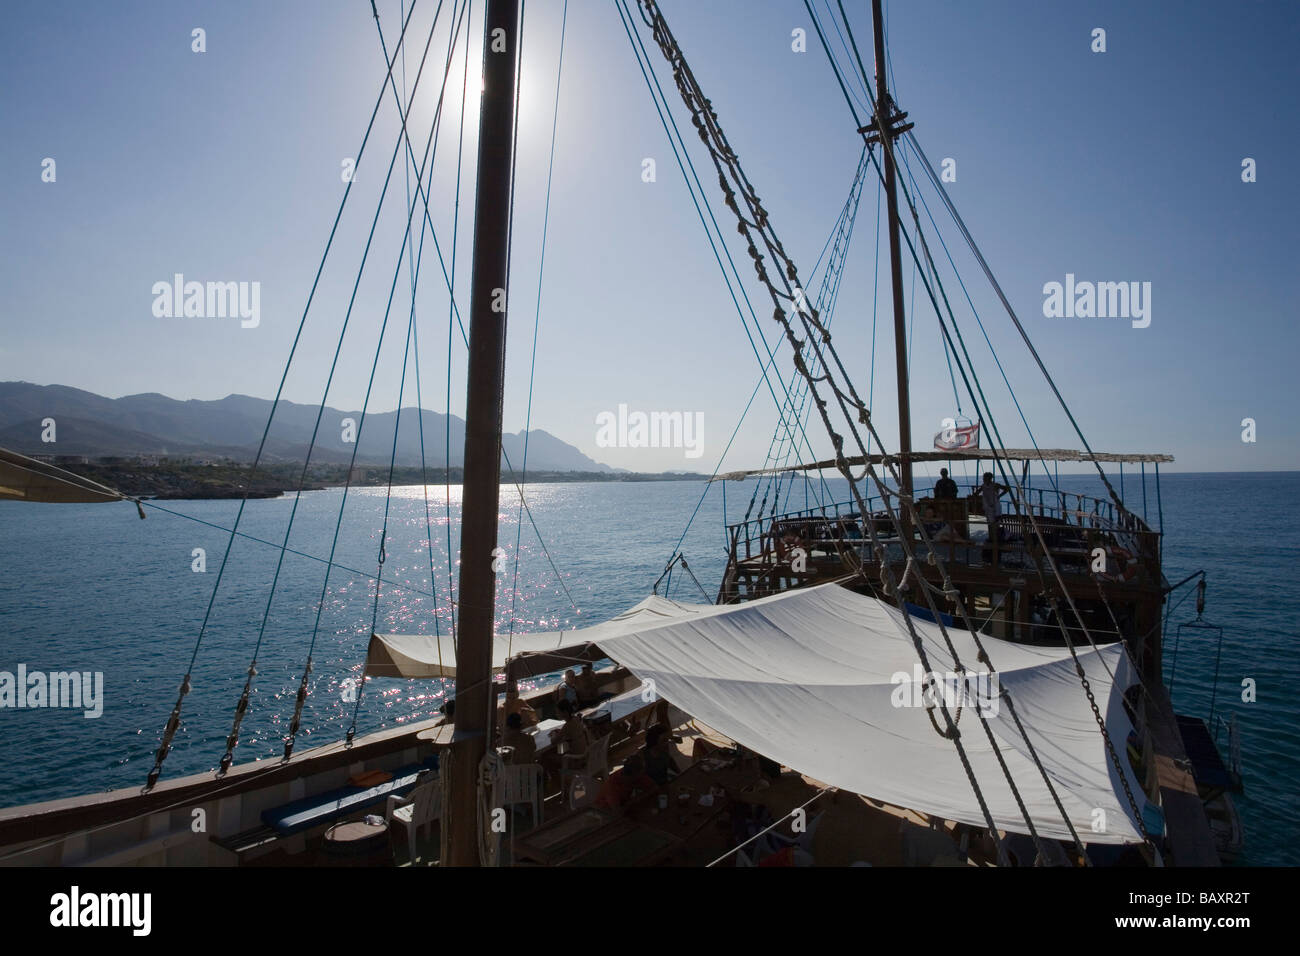 Neptun viaje en barco pirata, por Kaleidoskop Turizm y costa, Kyrenia, Chipre Girne, Imagen De Stock